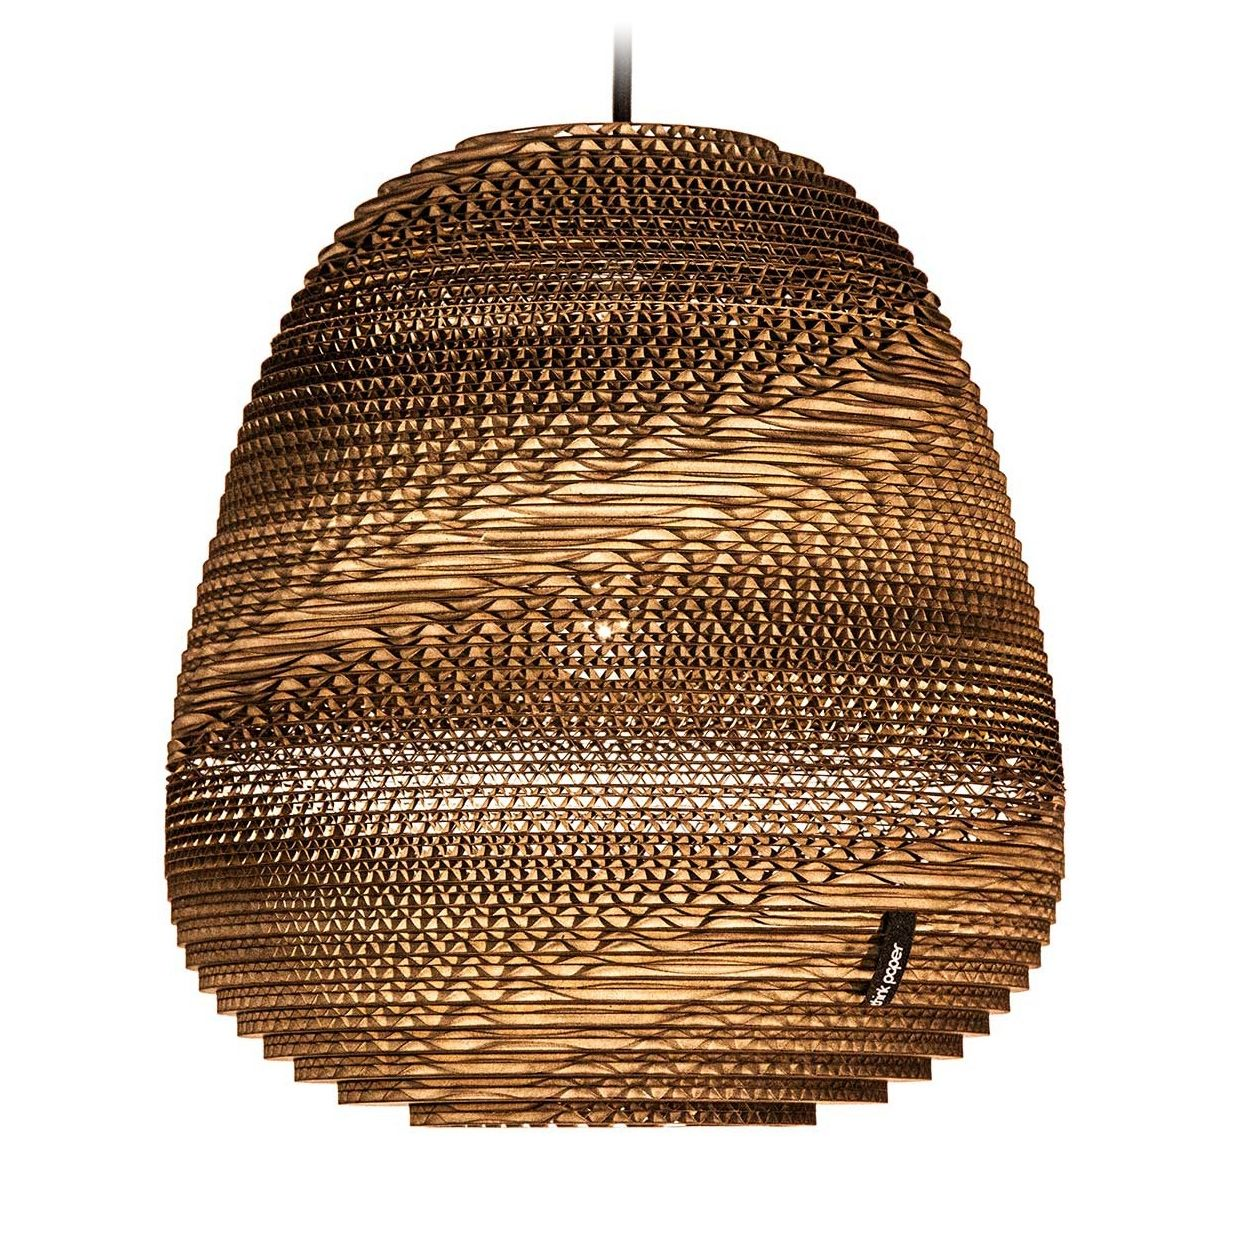 Binky hanglamp Think Paper Ø29